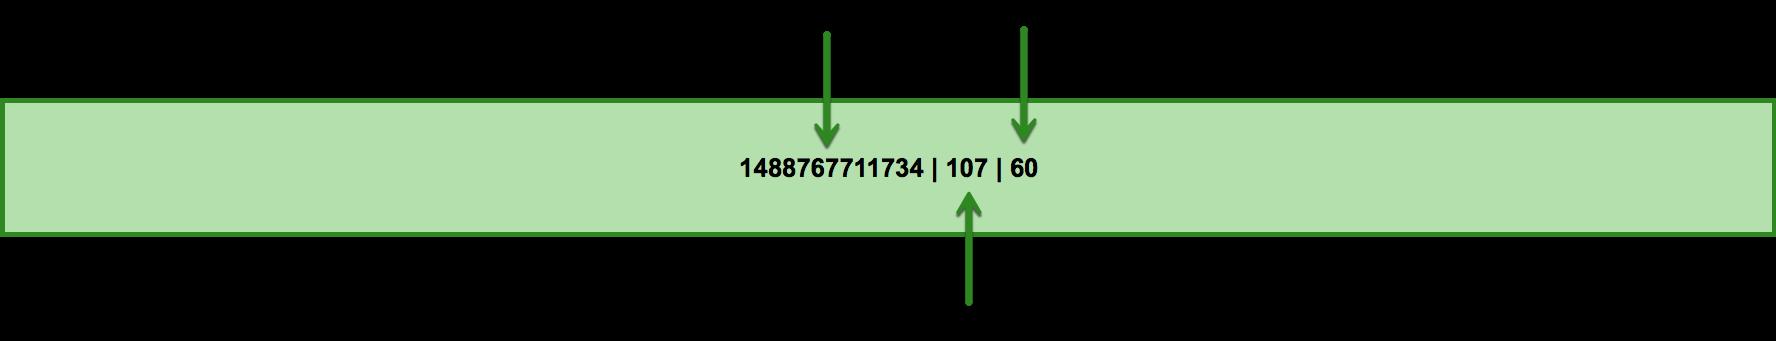 TrafficData fields